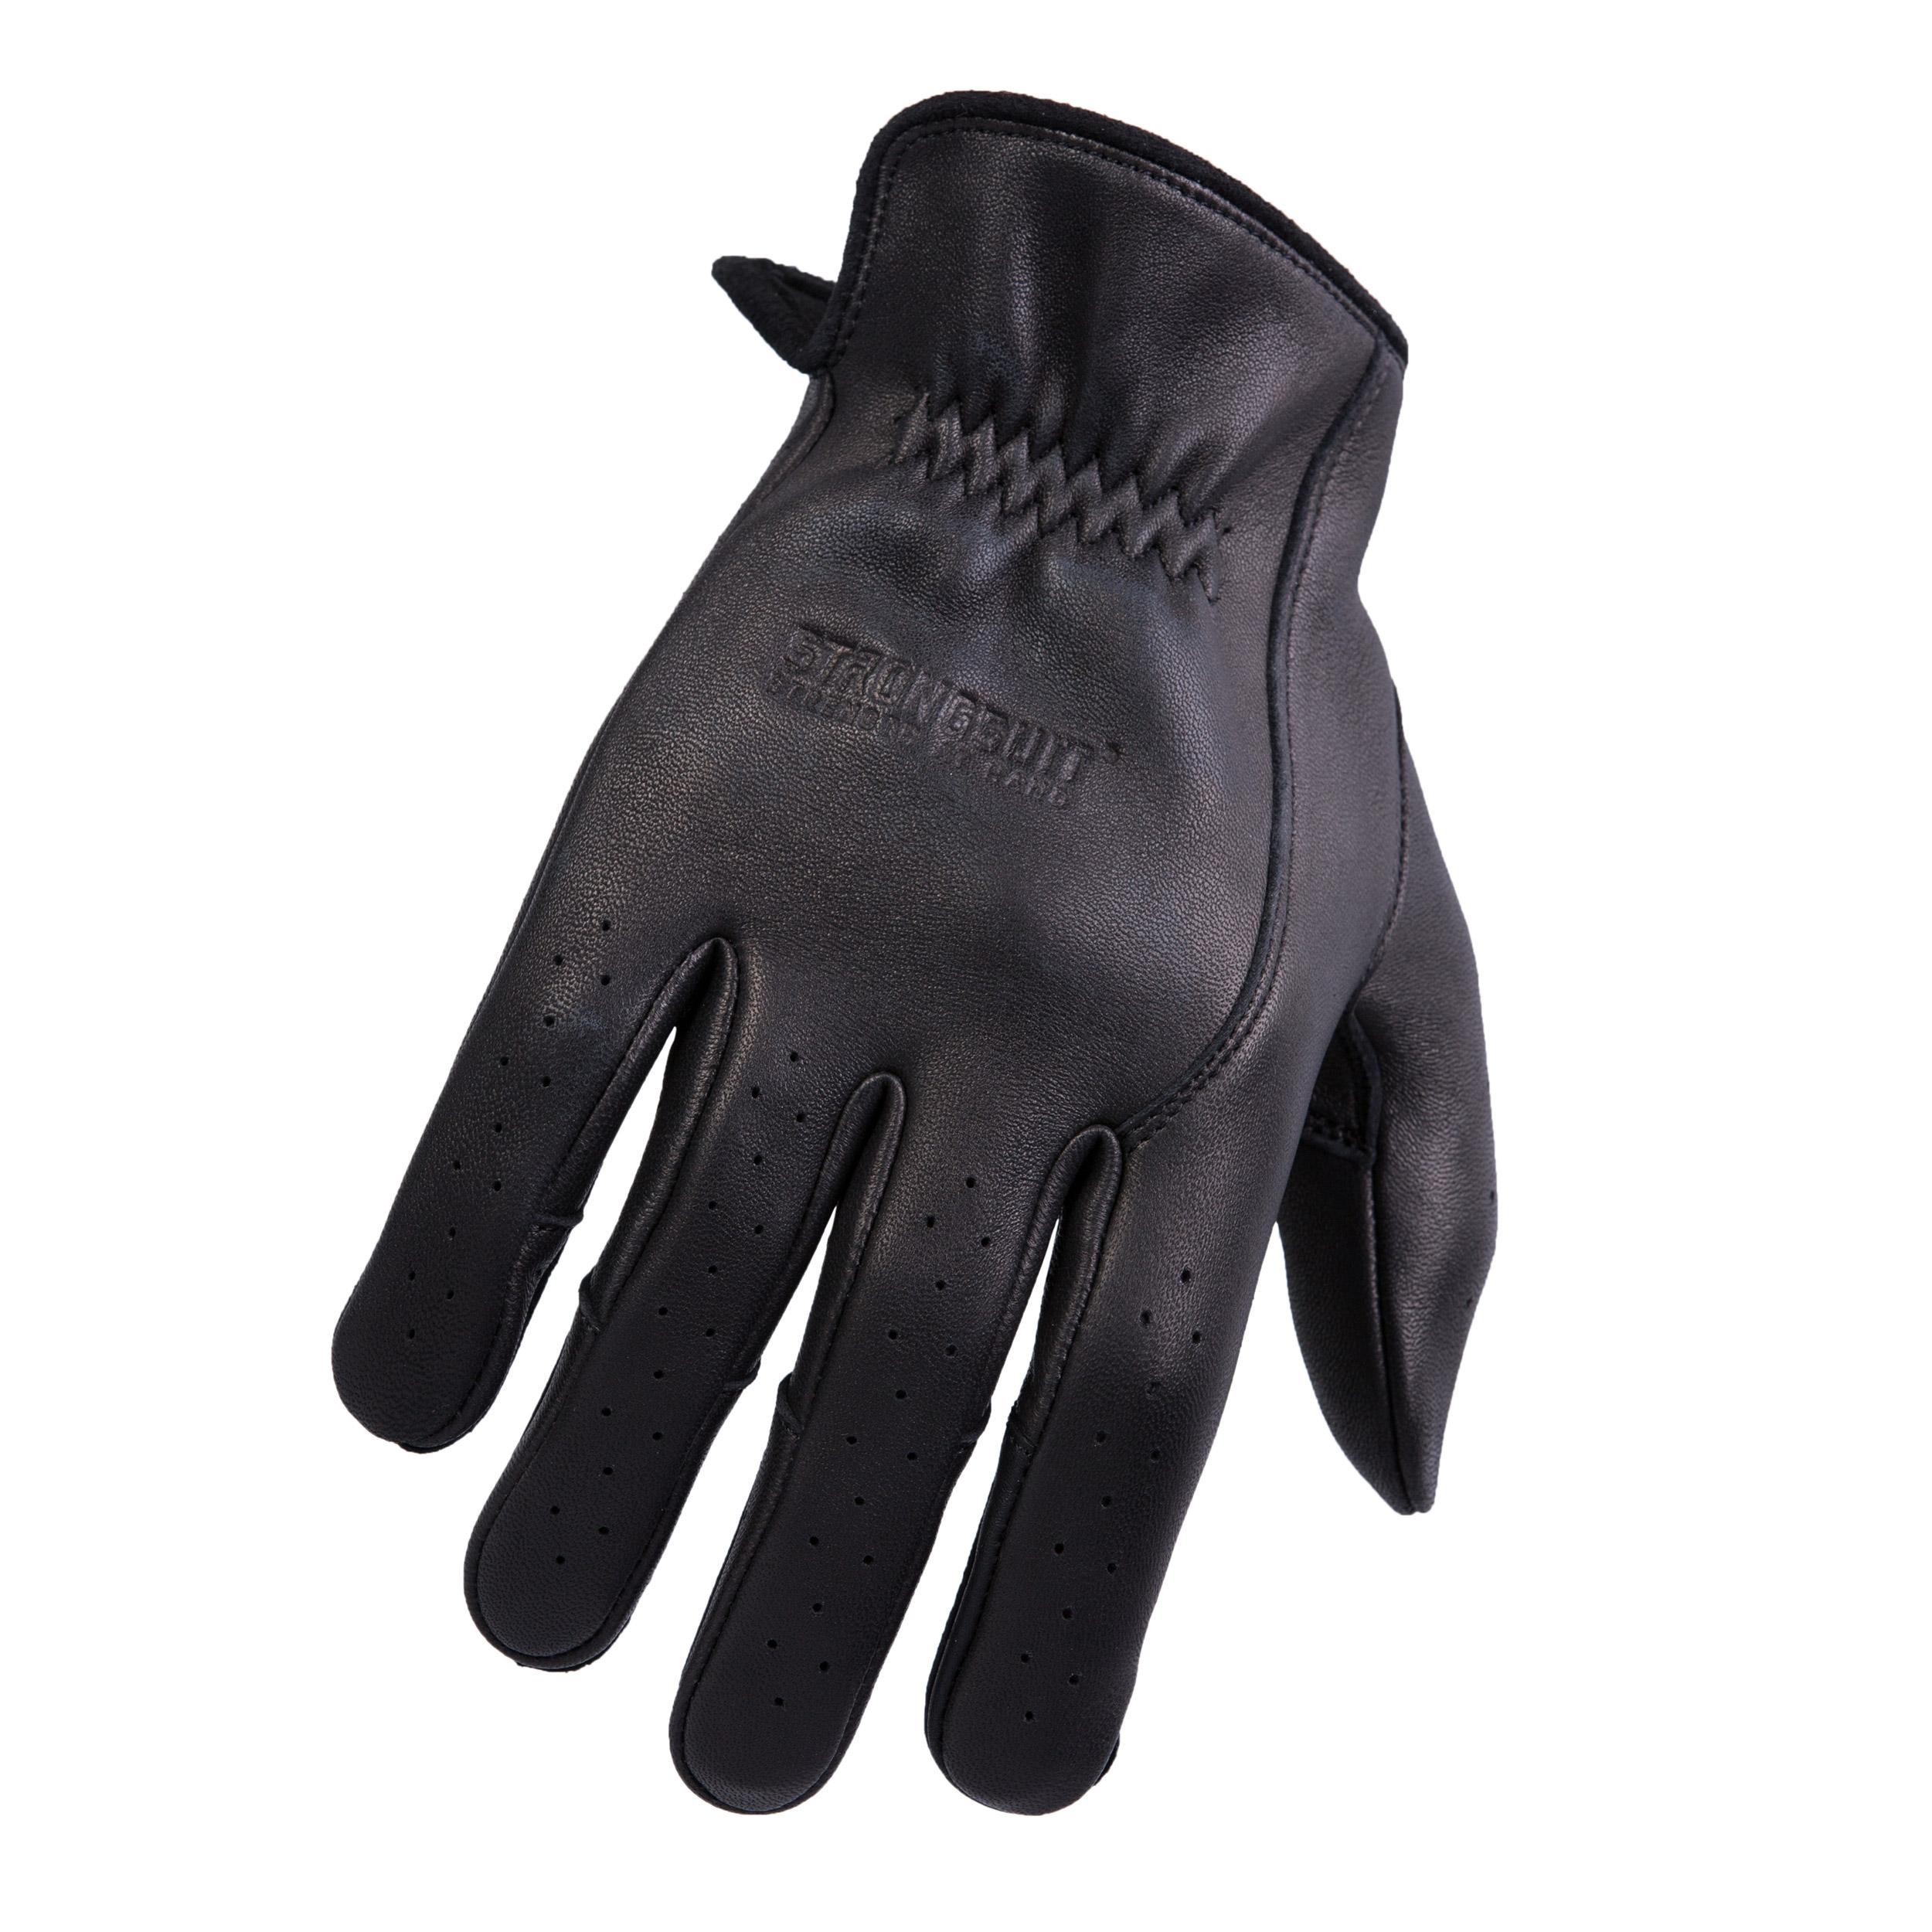 Essence Gloves, Black, Medium